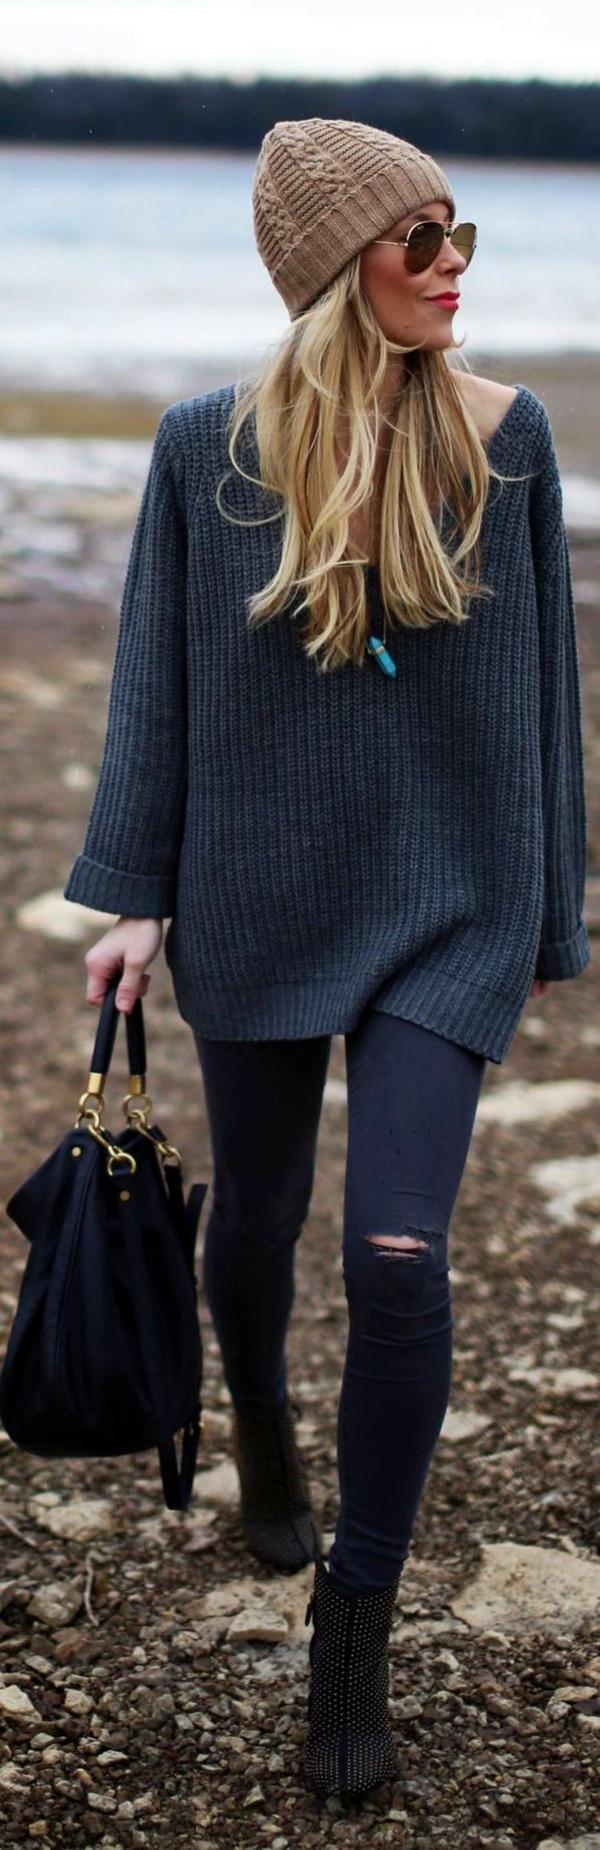 Winter Street Style Fashion 2015 (4)